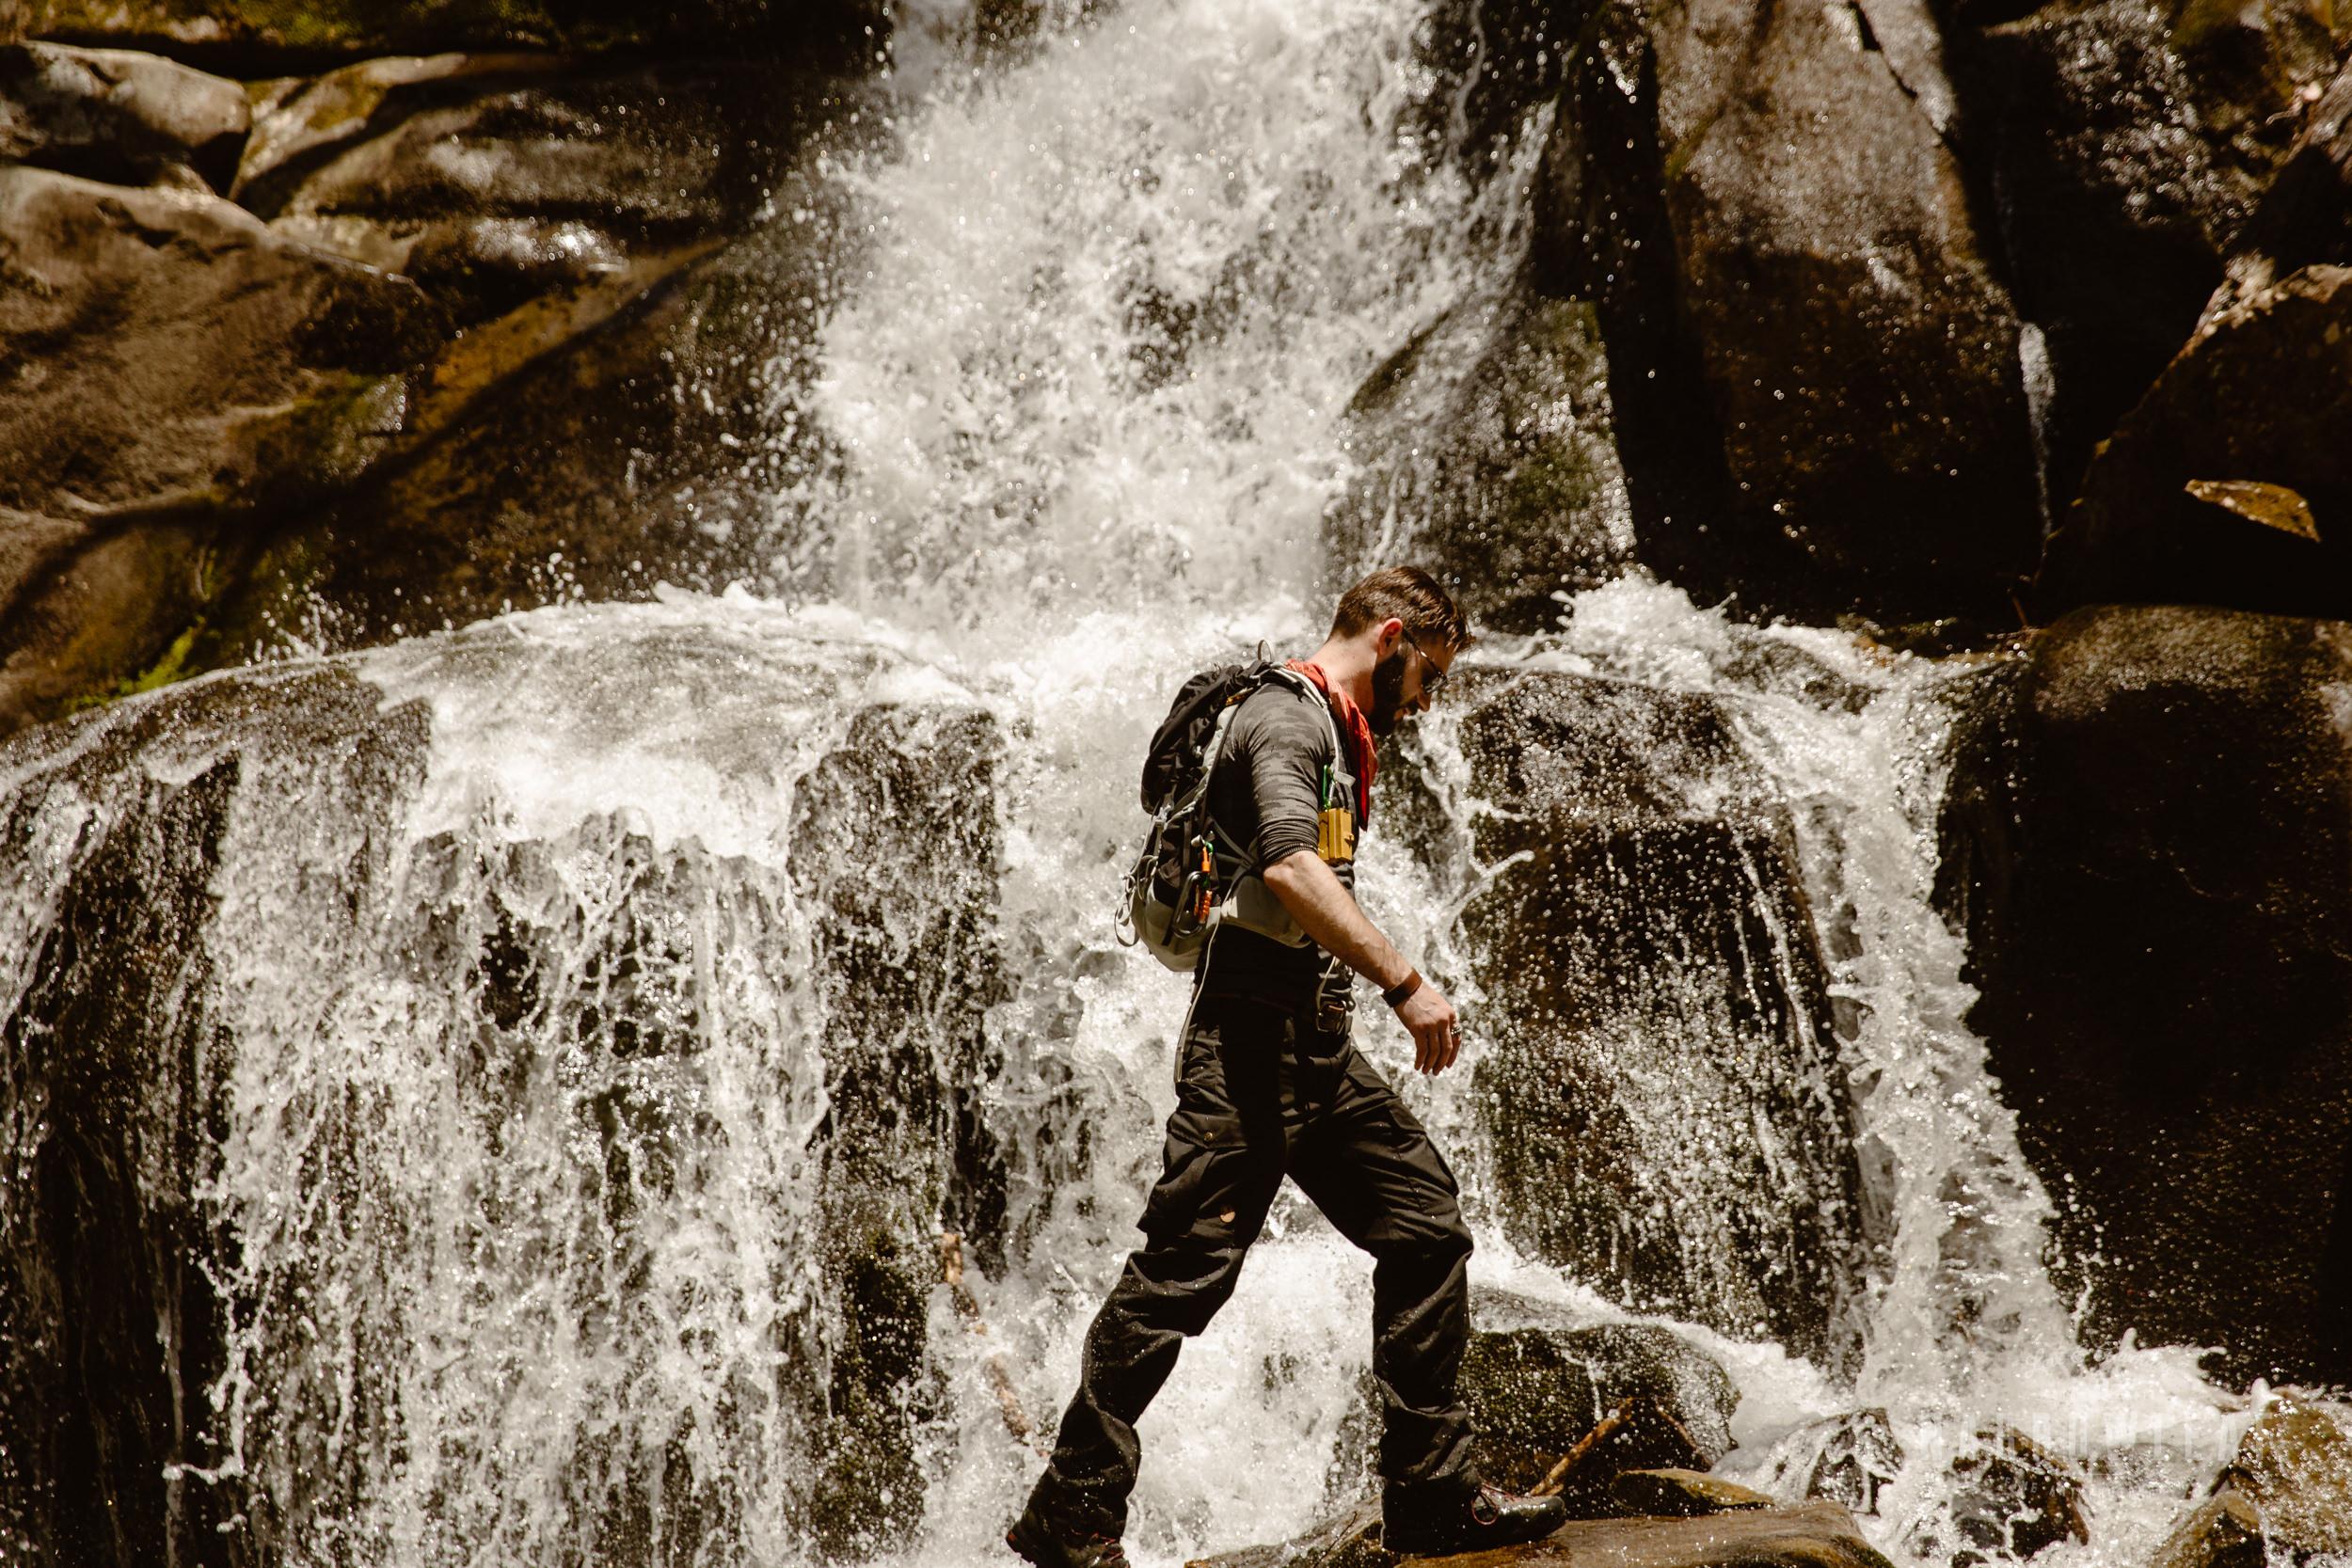 Ramsey-Cascades-Trail-Tenneessee-elopement-photographer-Narrowleaf_Love_and_Adventure_Photography-0047.jpg